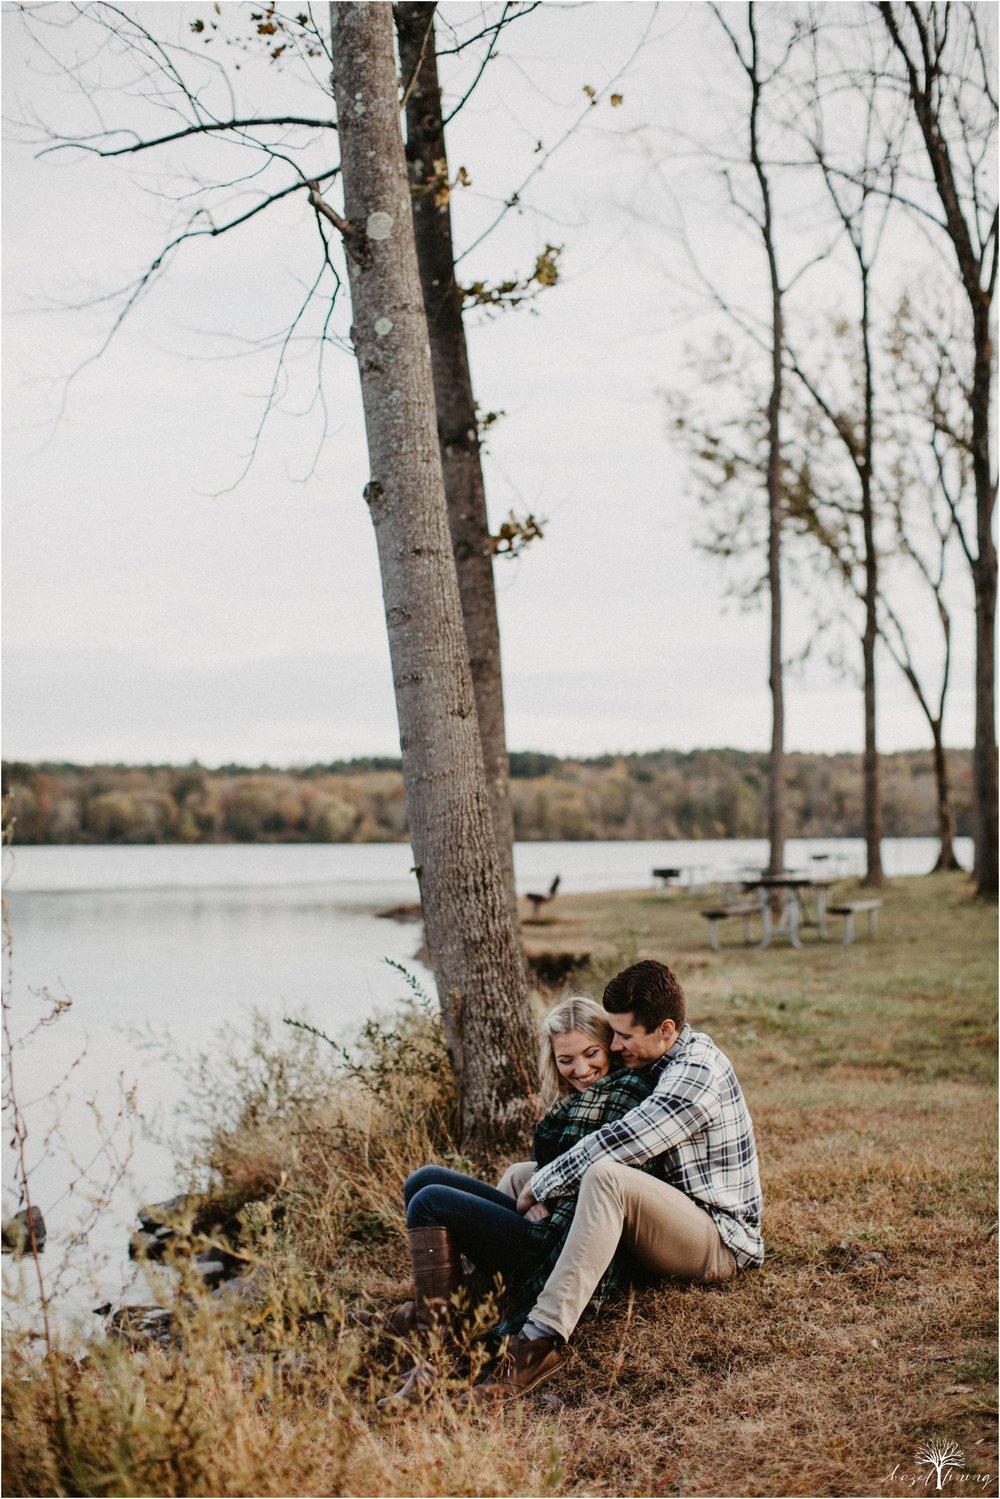 jessica-kern-david-siepietowski-lake-nockamixon-autumn-engagement-session_0036.jpg